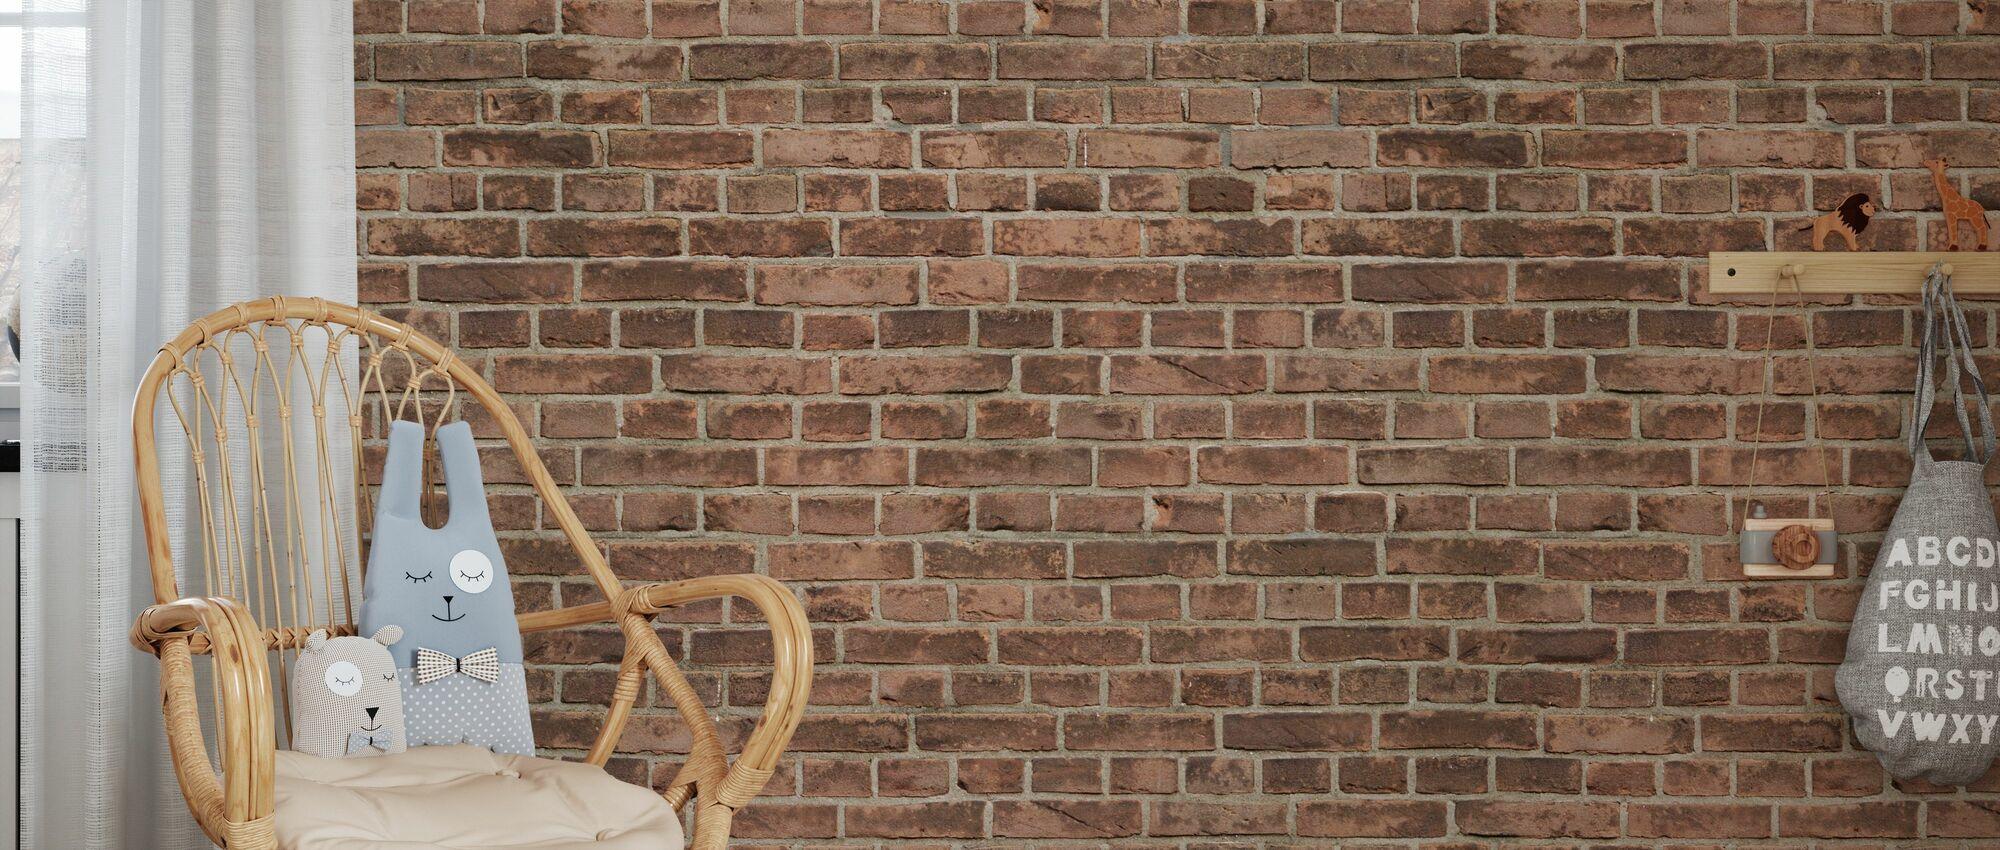 Amsterdam Brick Wall - Wallpaper - Kids Room